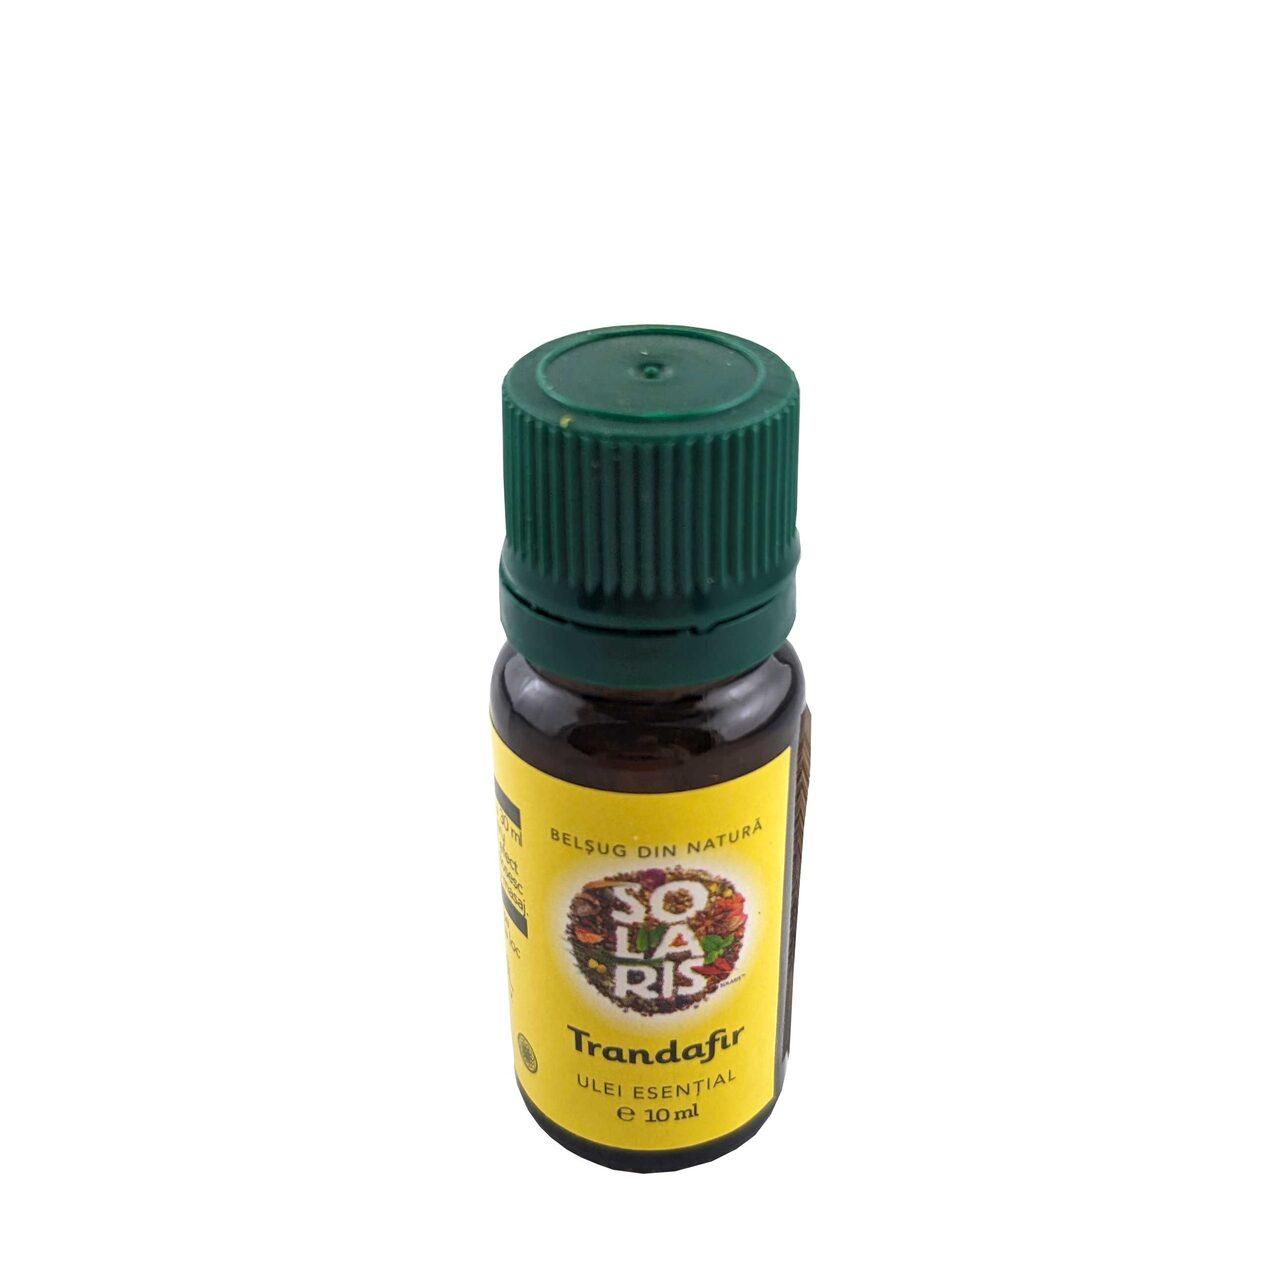 ulei esențial de trandafir cu varicoză